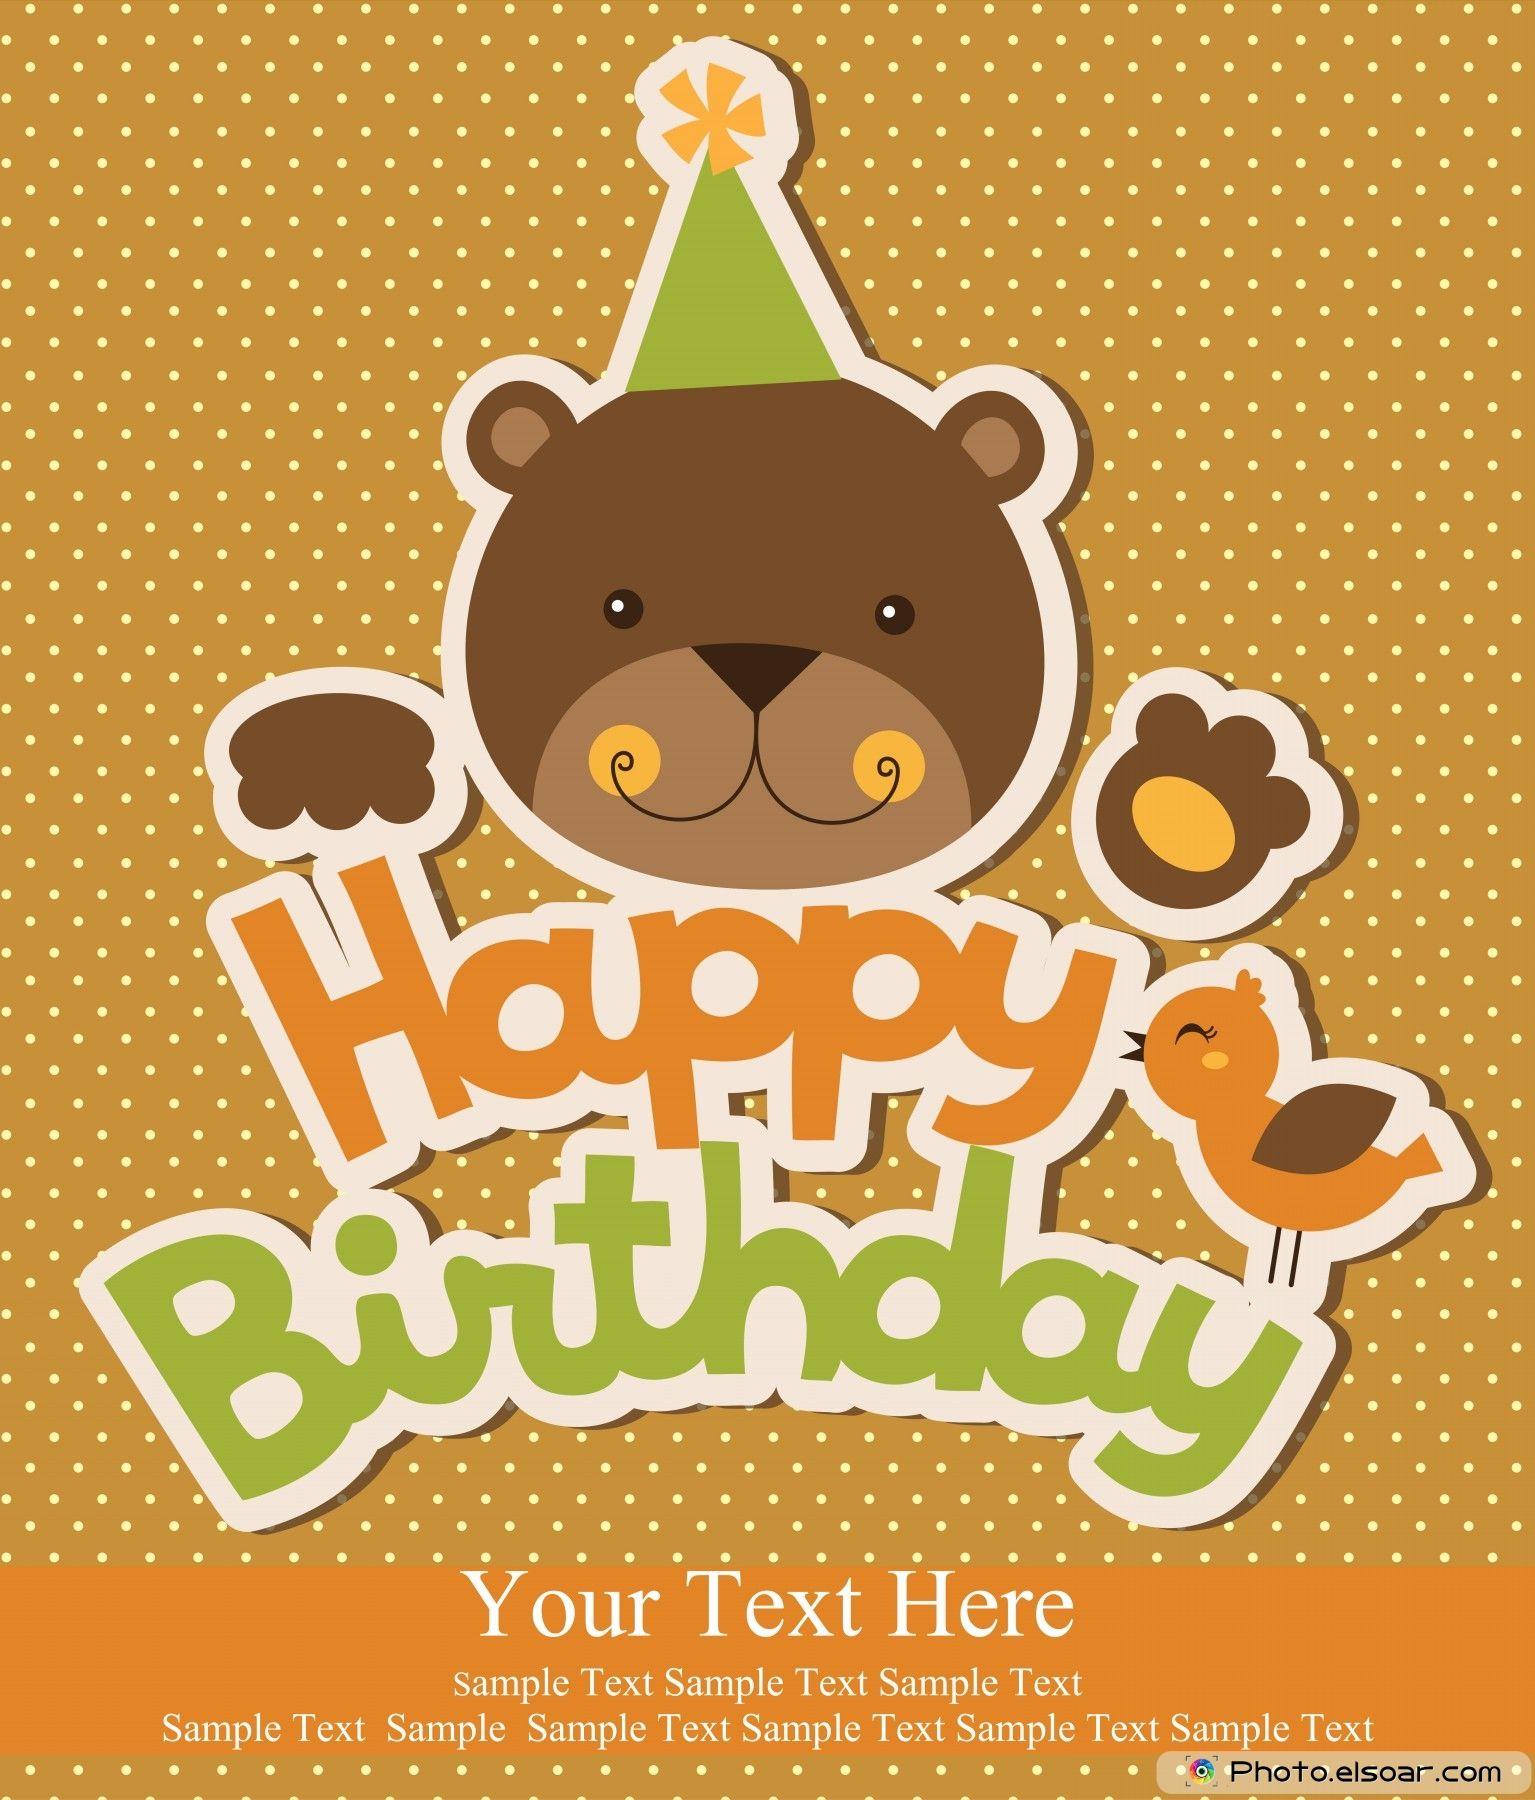 Happy Birthday Card Design With Cartoon Bear Happy Birthday Card Design Birthday Card Design Happy Birthday Text